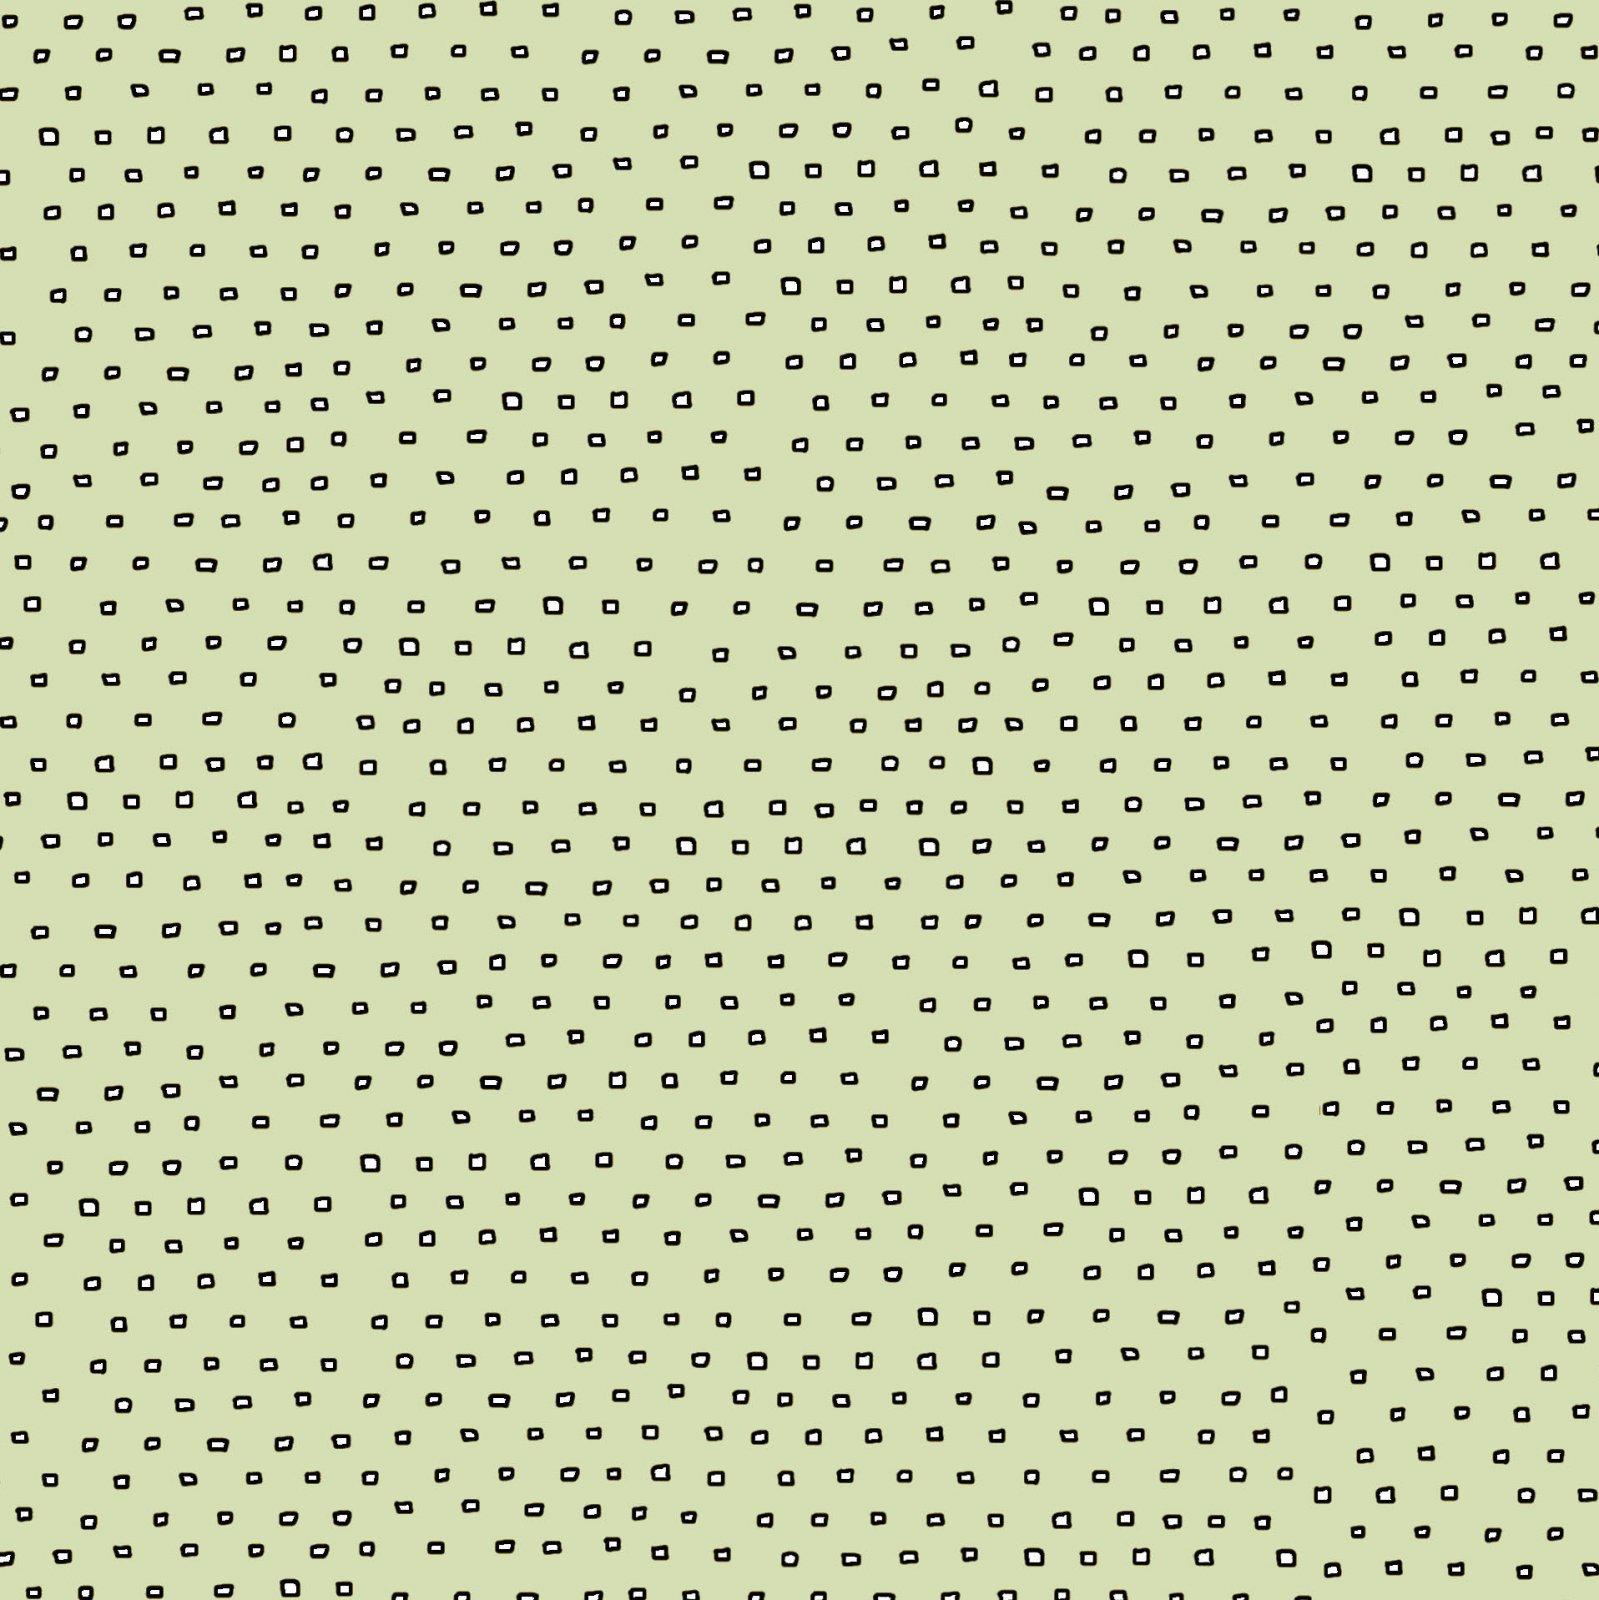 Pixie Dots - Green Tea - 24299-HJ